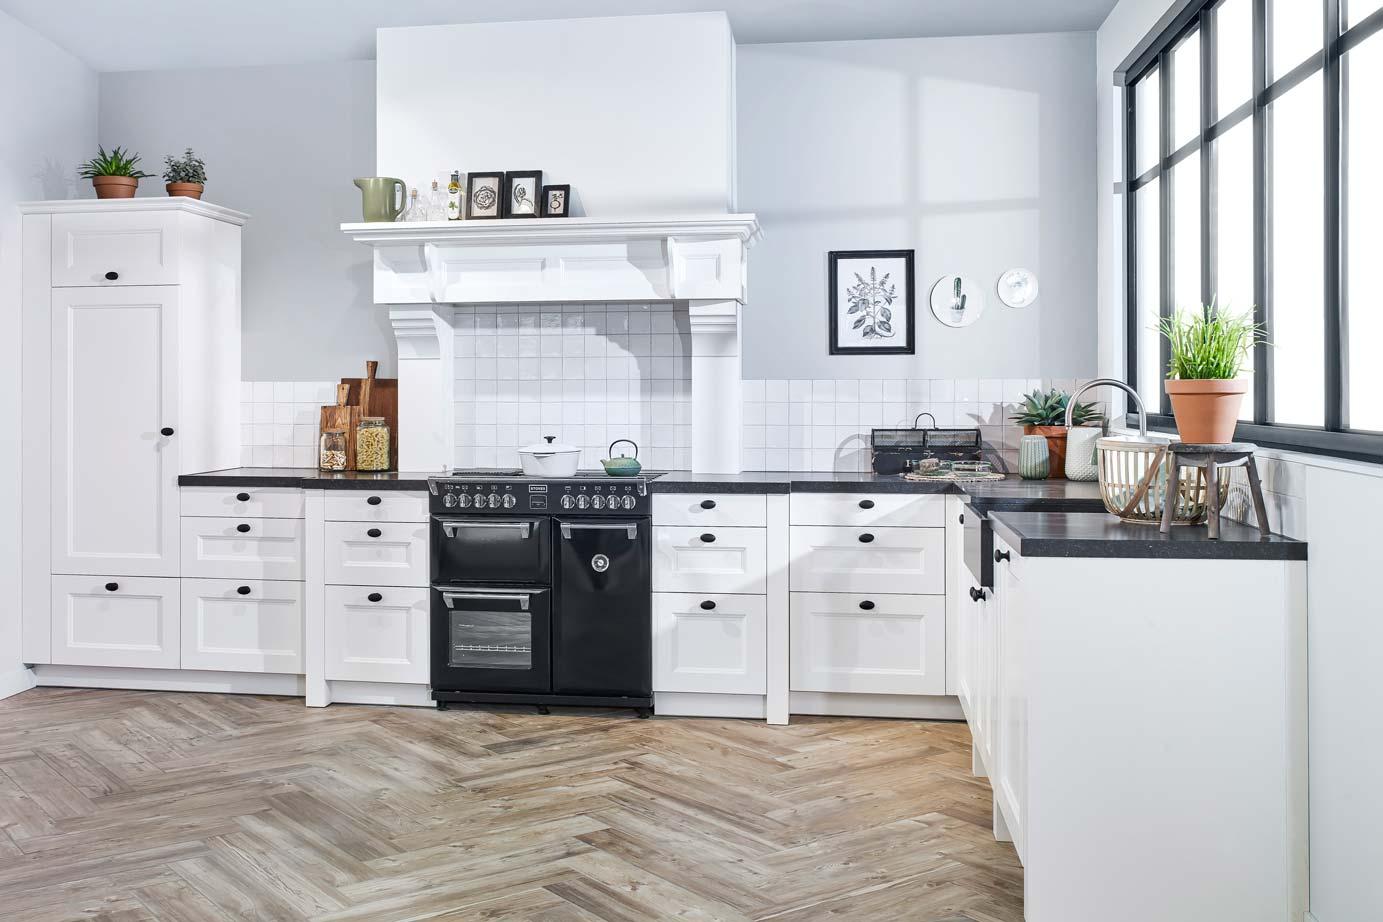 Moderne Retro Keuken : Keuken ikea